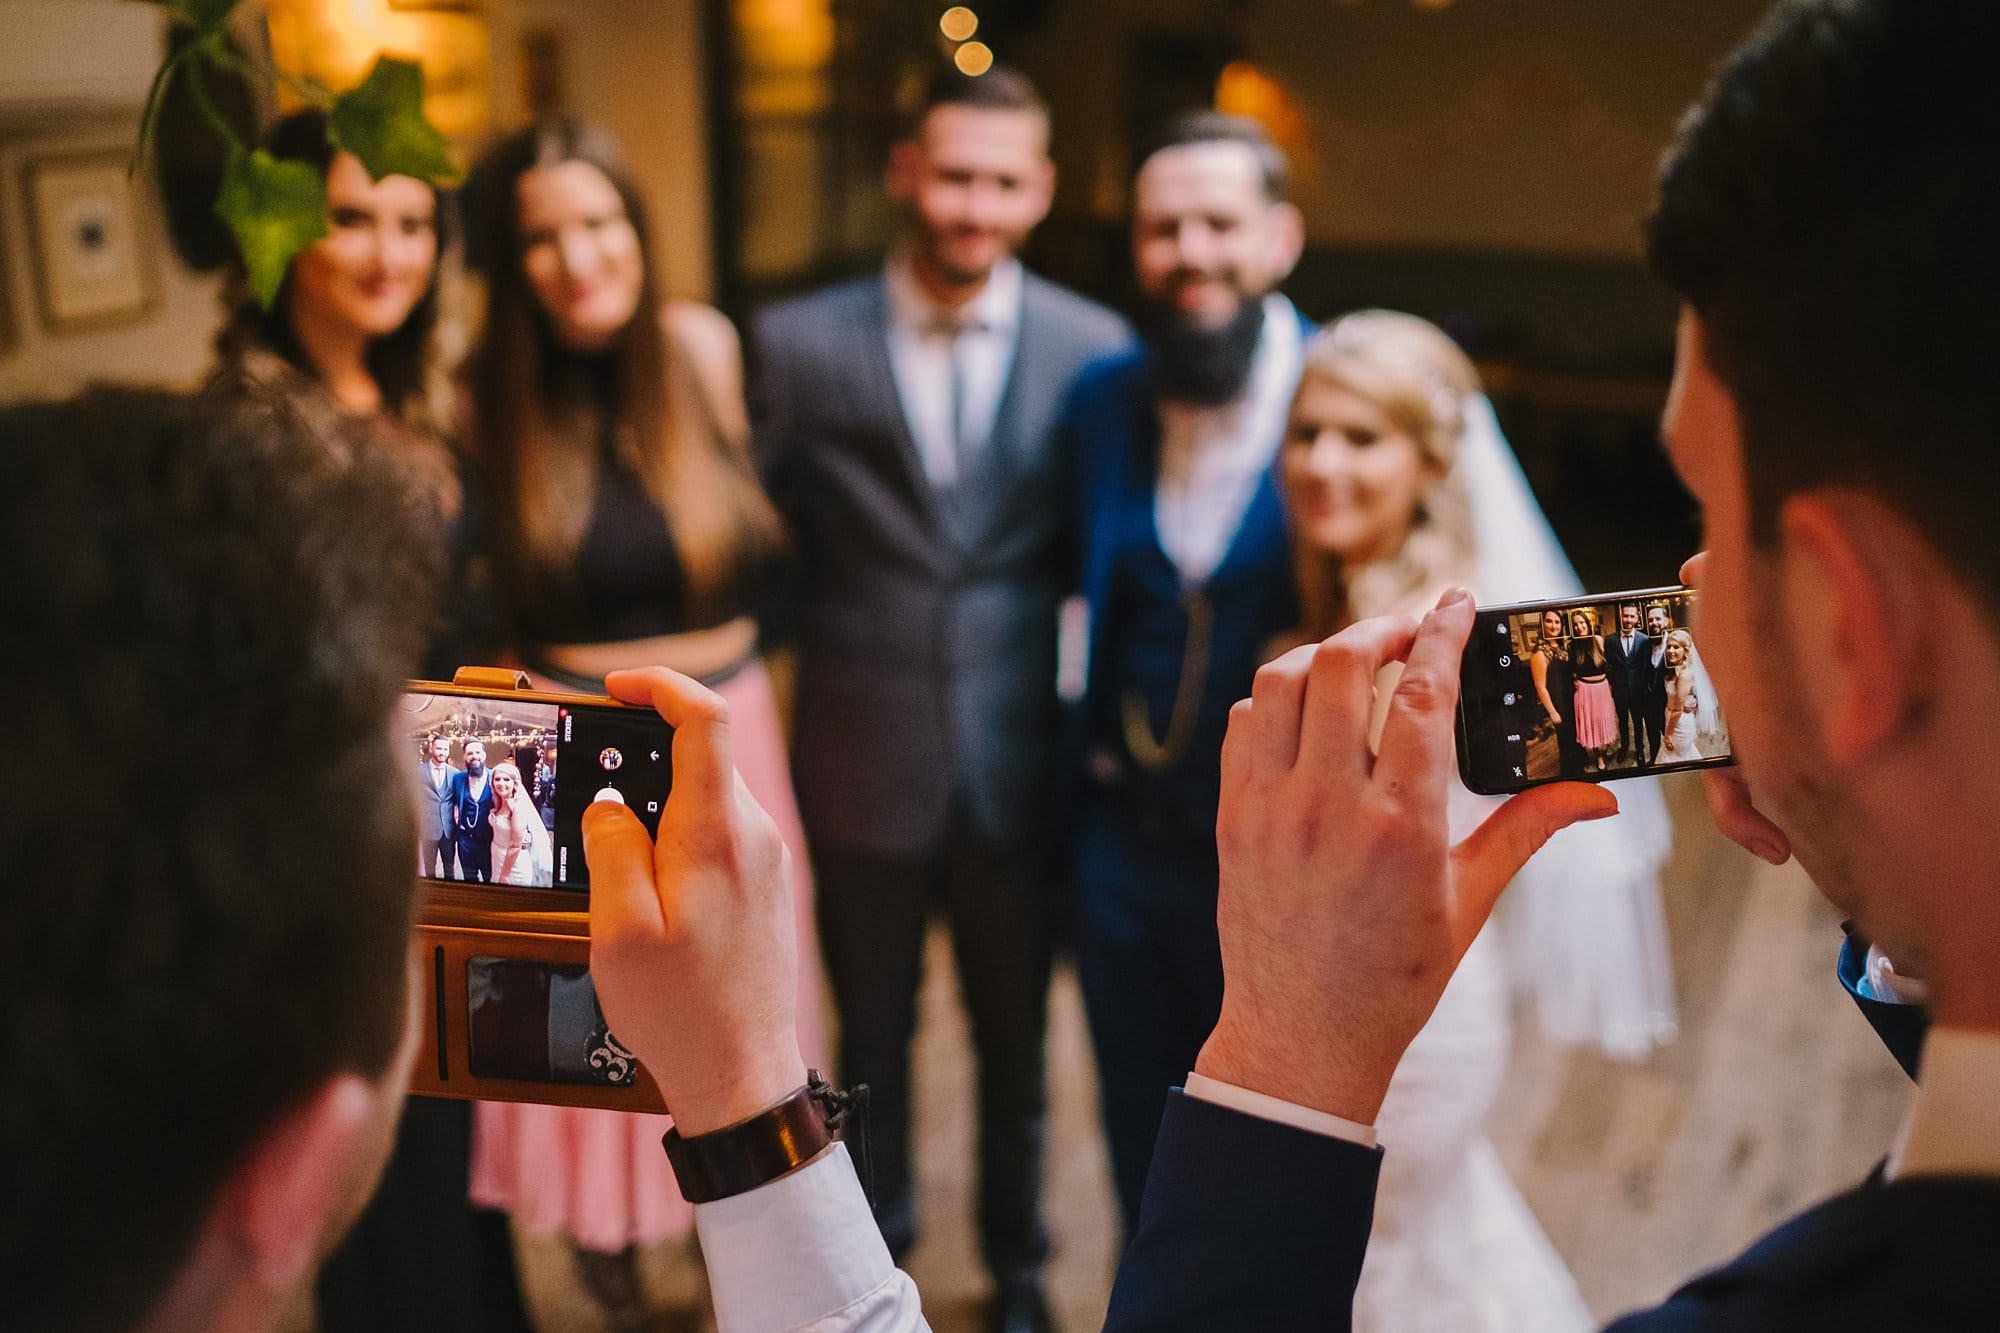 london pub wedding photographer jn 065 - The County Arms Wedding Photographer   Jen & Nick